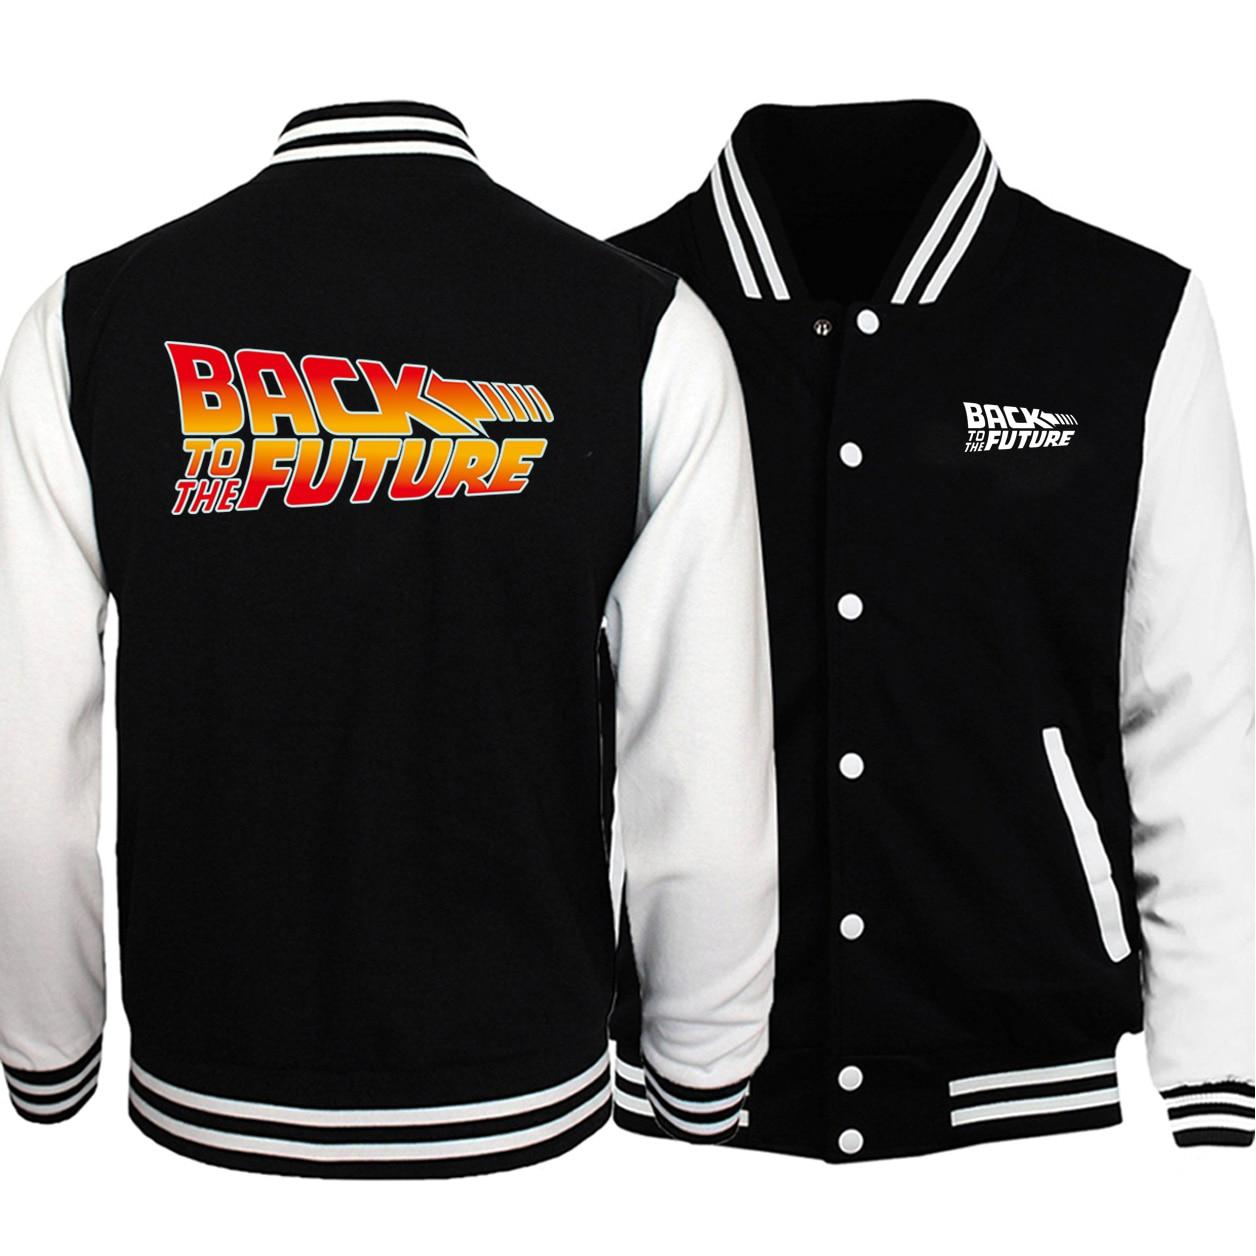 Back to the future Mens baseball jacket Coat Fashion uniform fluffy fleece sweatshirt 2020 fall winter funny button hoodies Men